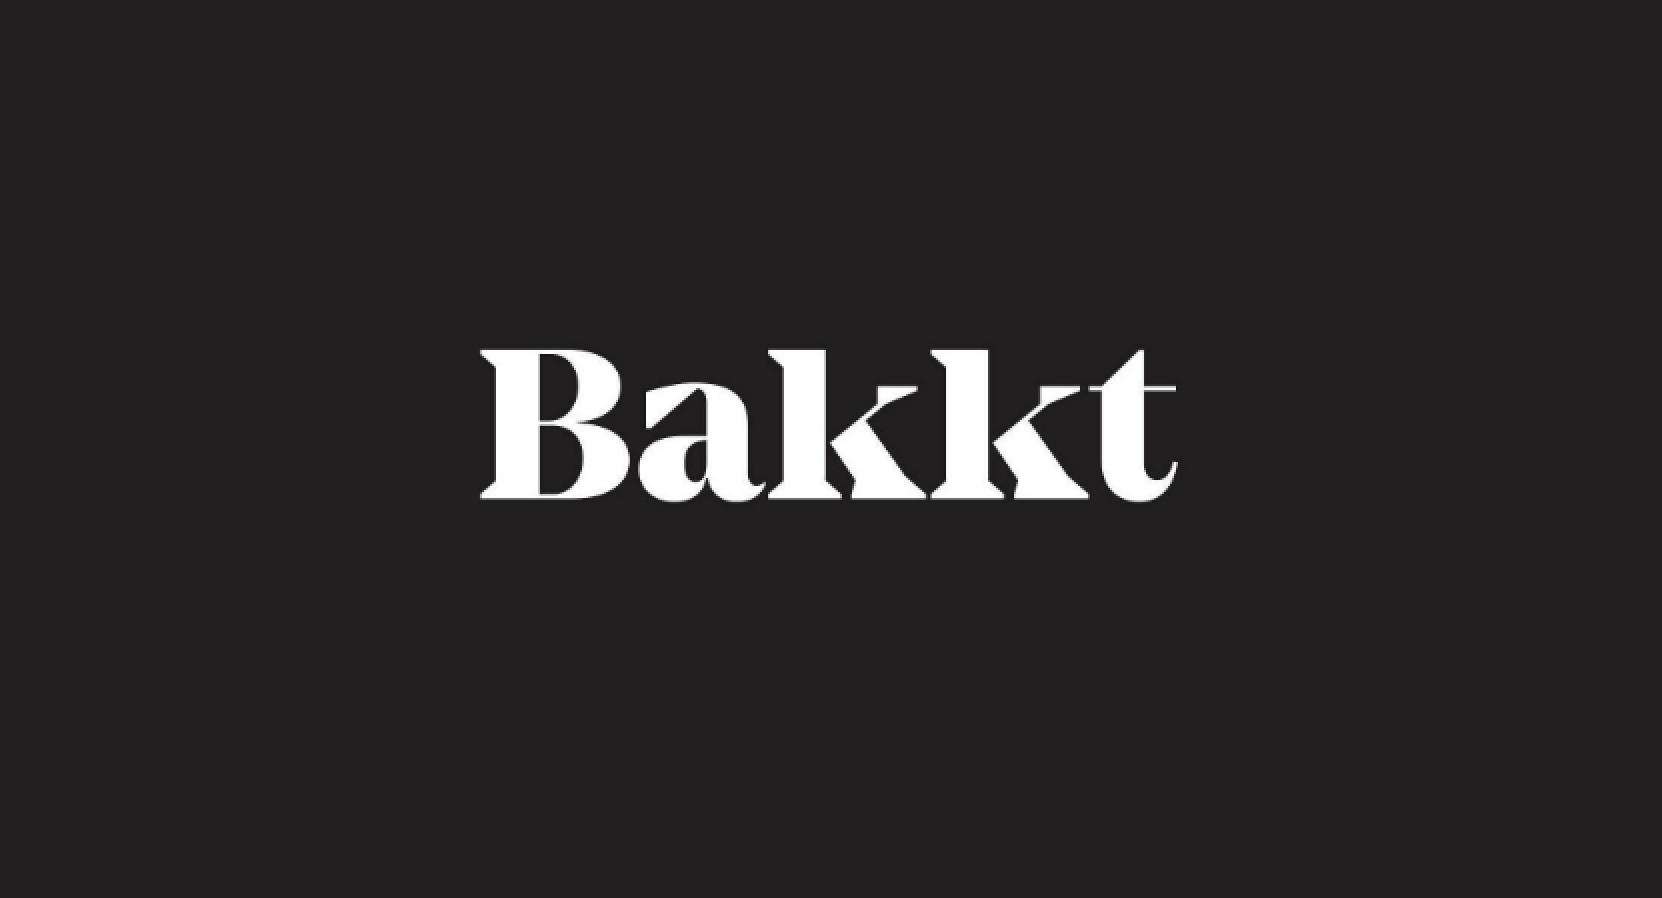 Bakkt Continues Expansion Despite CFTC Delay & Crypto Bear Market